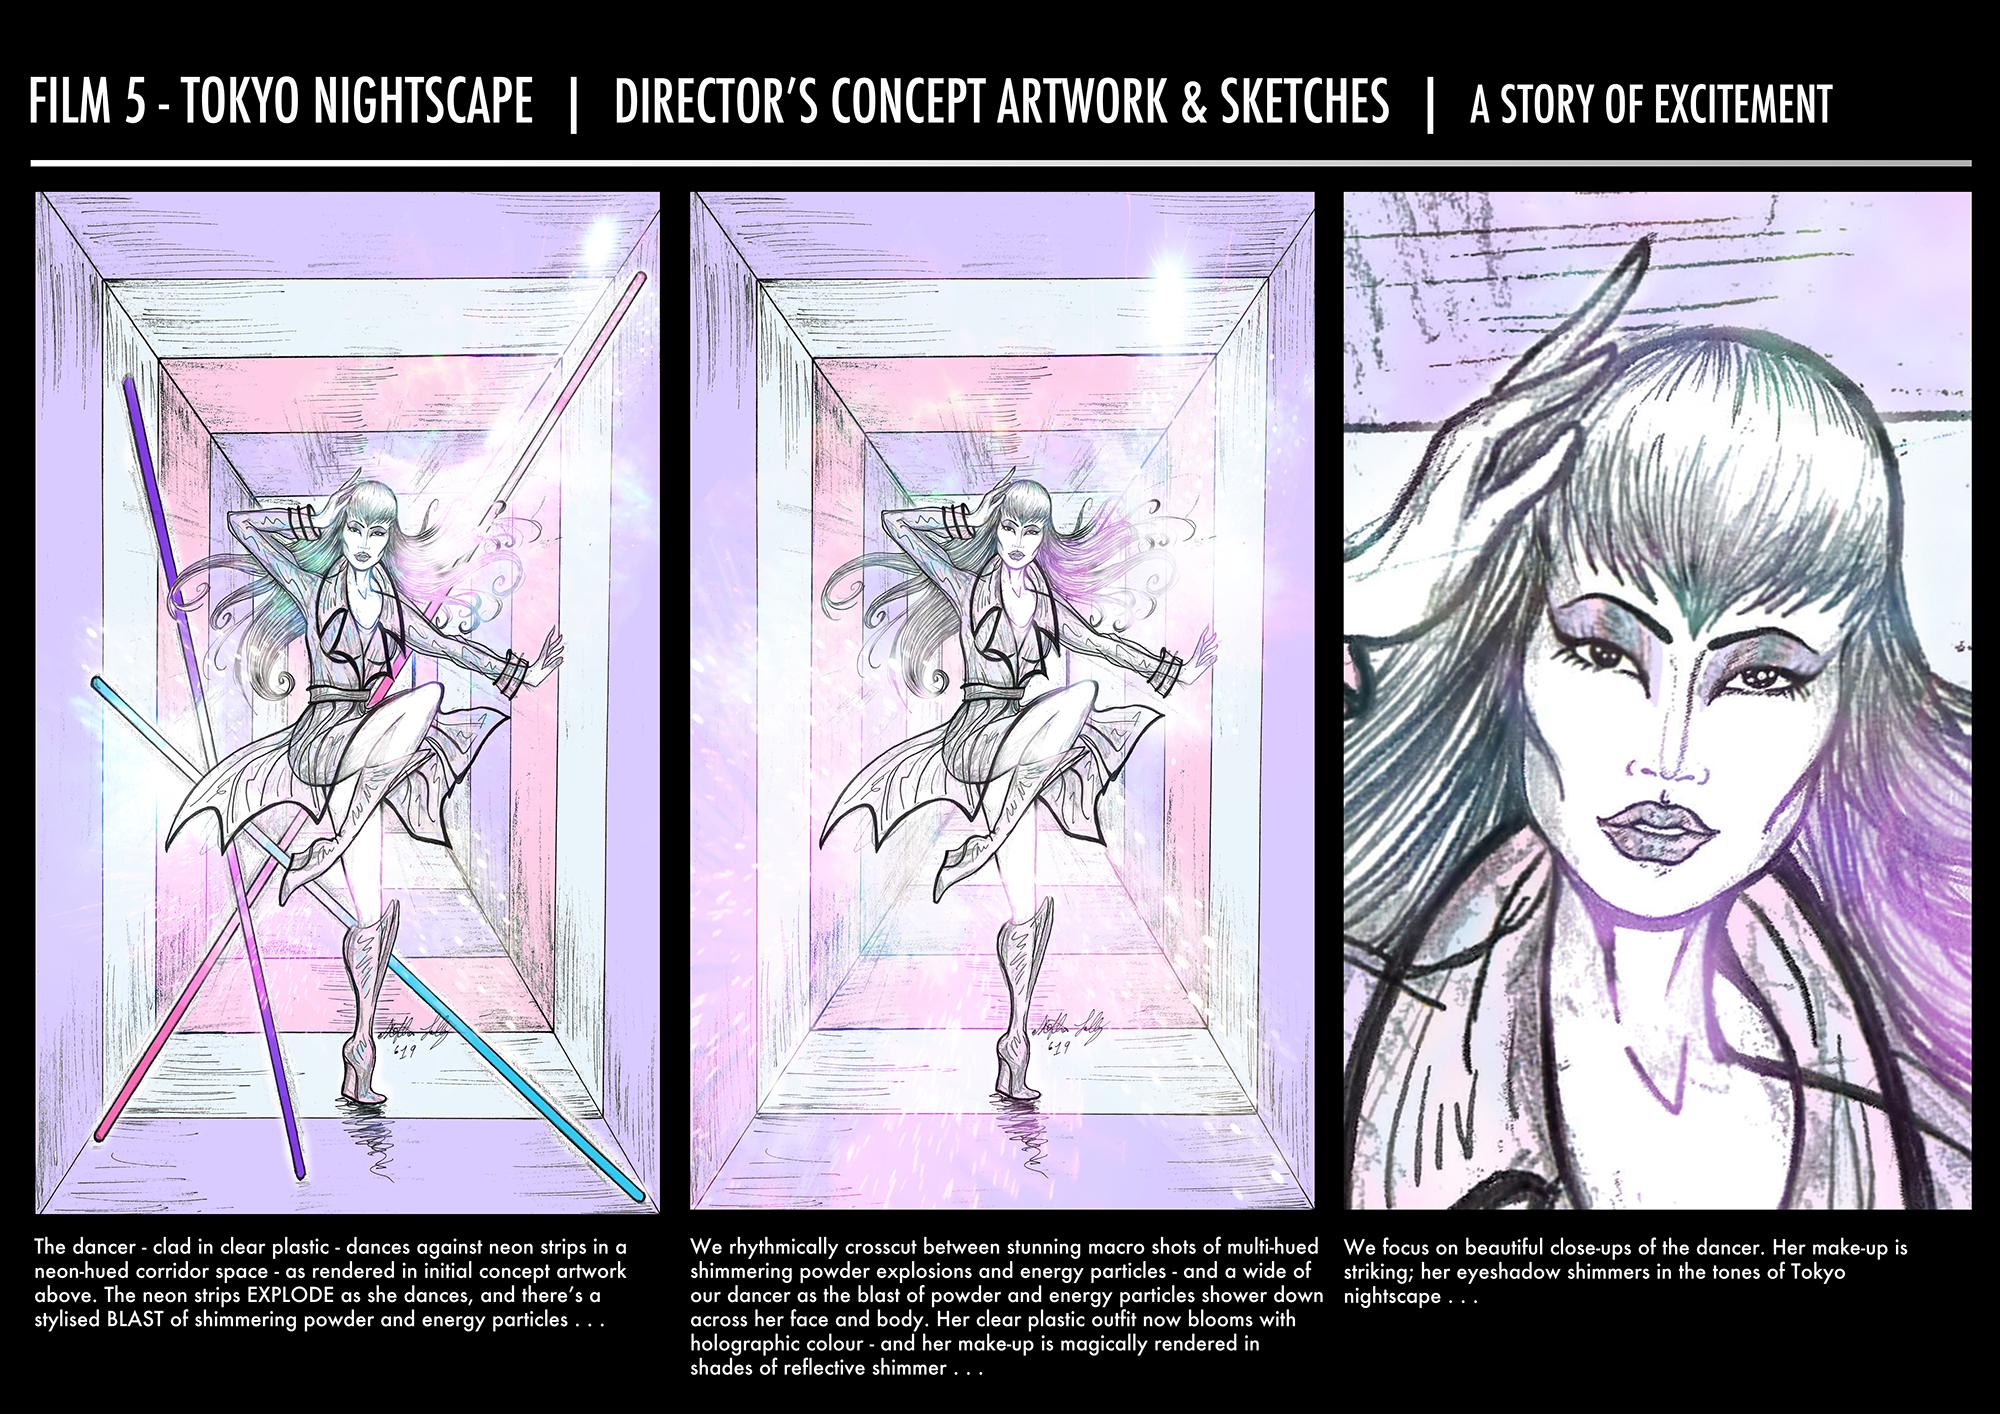 stephen_lally_storyboard_artwork_05.png